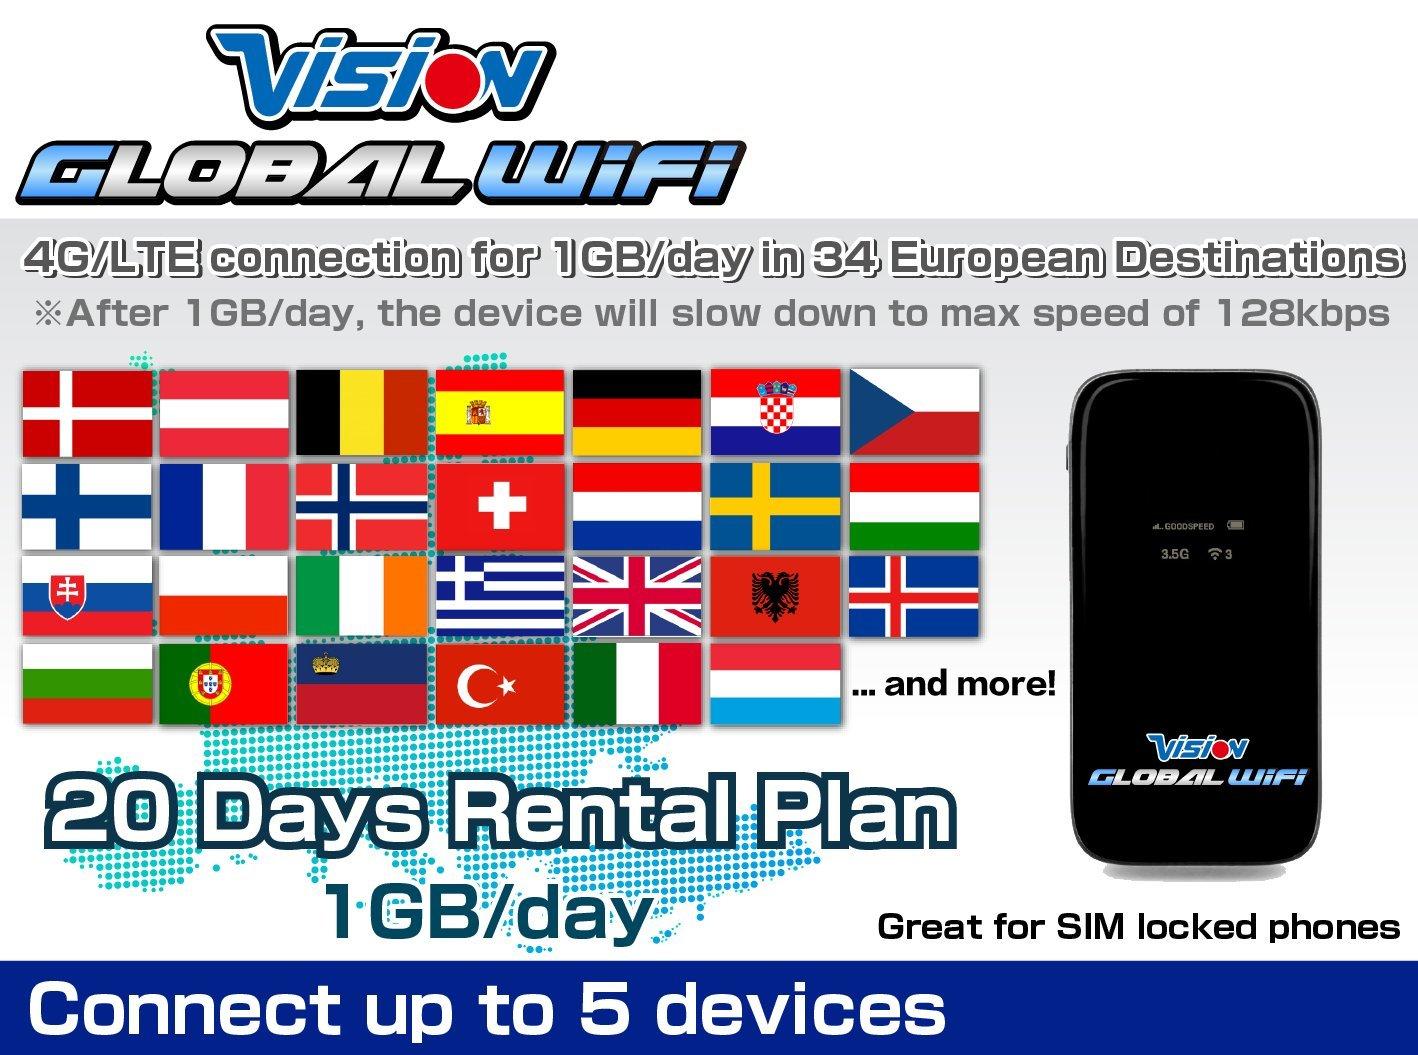 Vodafone SIM Card 4G/LTE Europe Mobile WiFi Hotspot Rentals 1GB/day - 20 Day